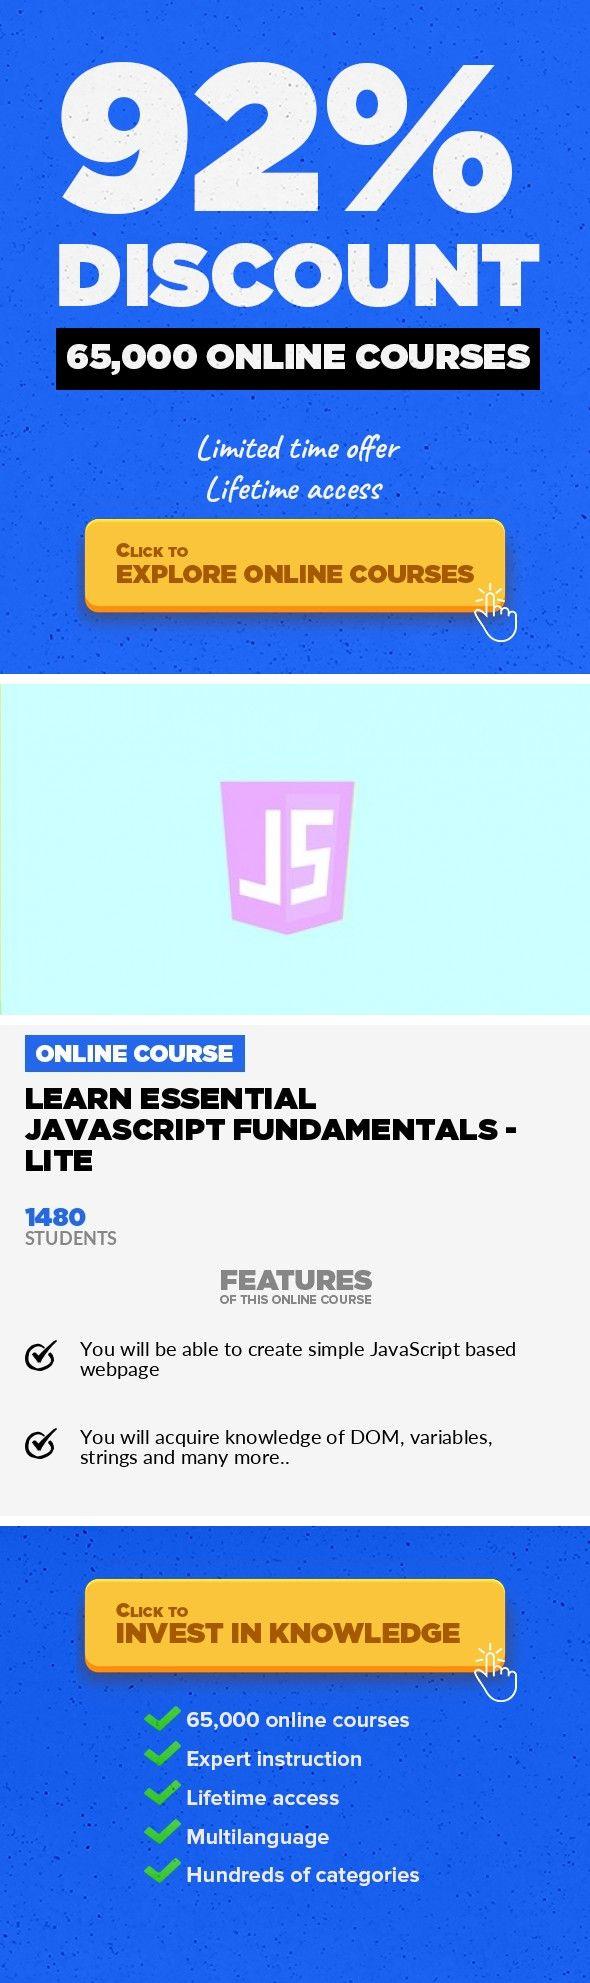 Learn Essential Javascript Fundamentals Lite Web Development